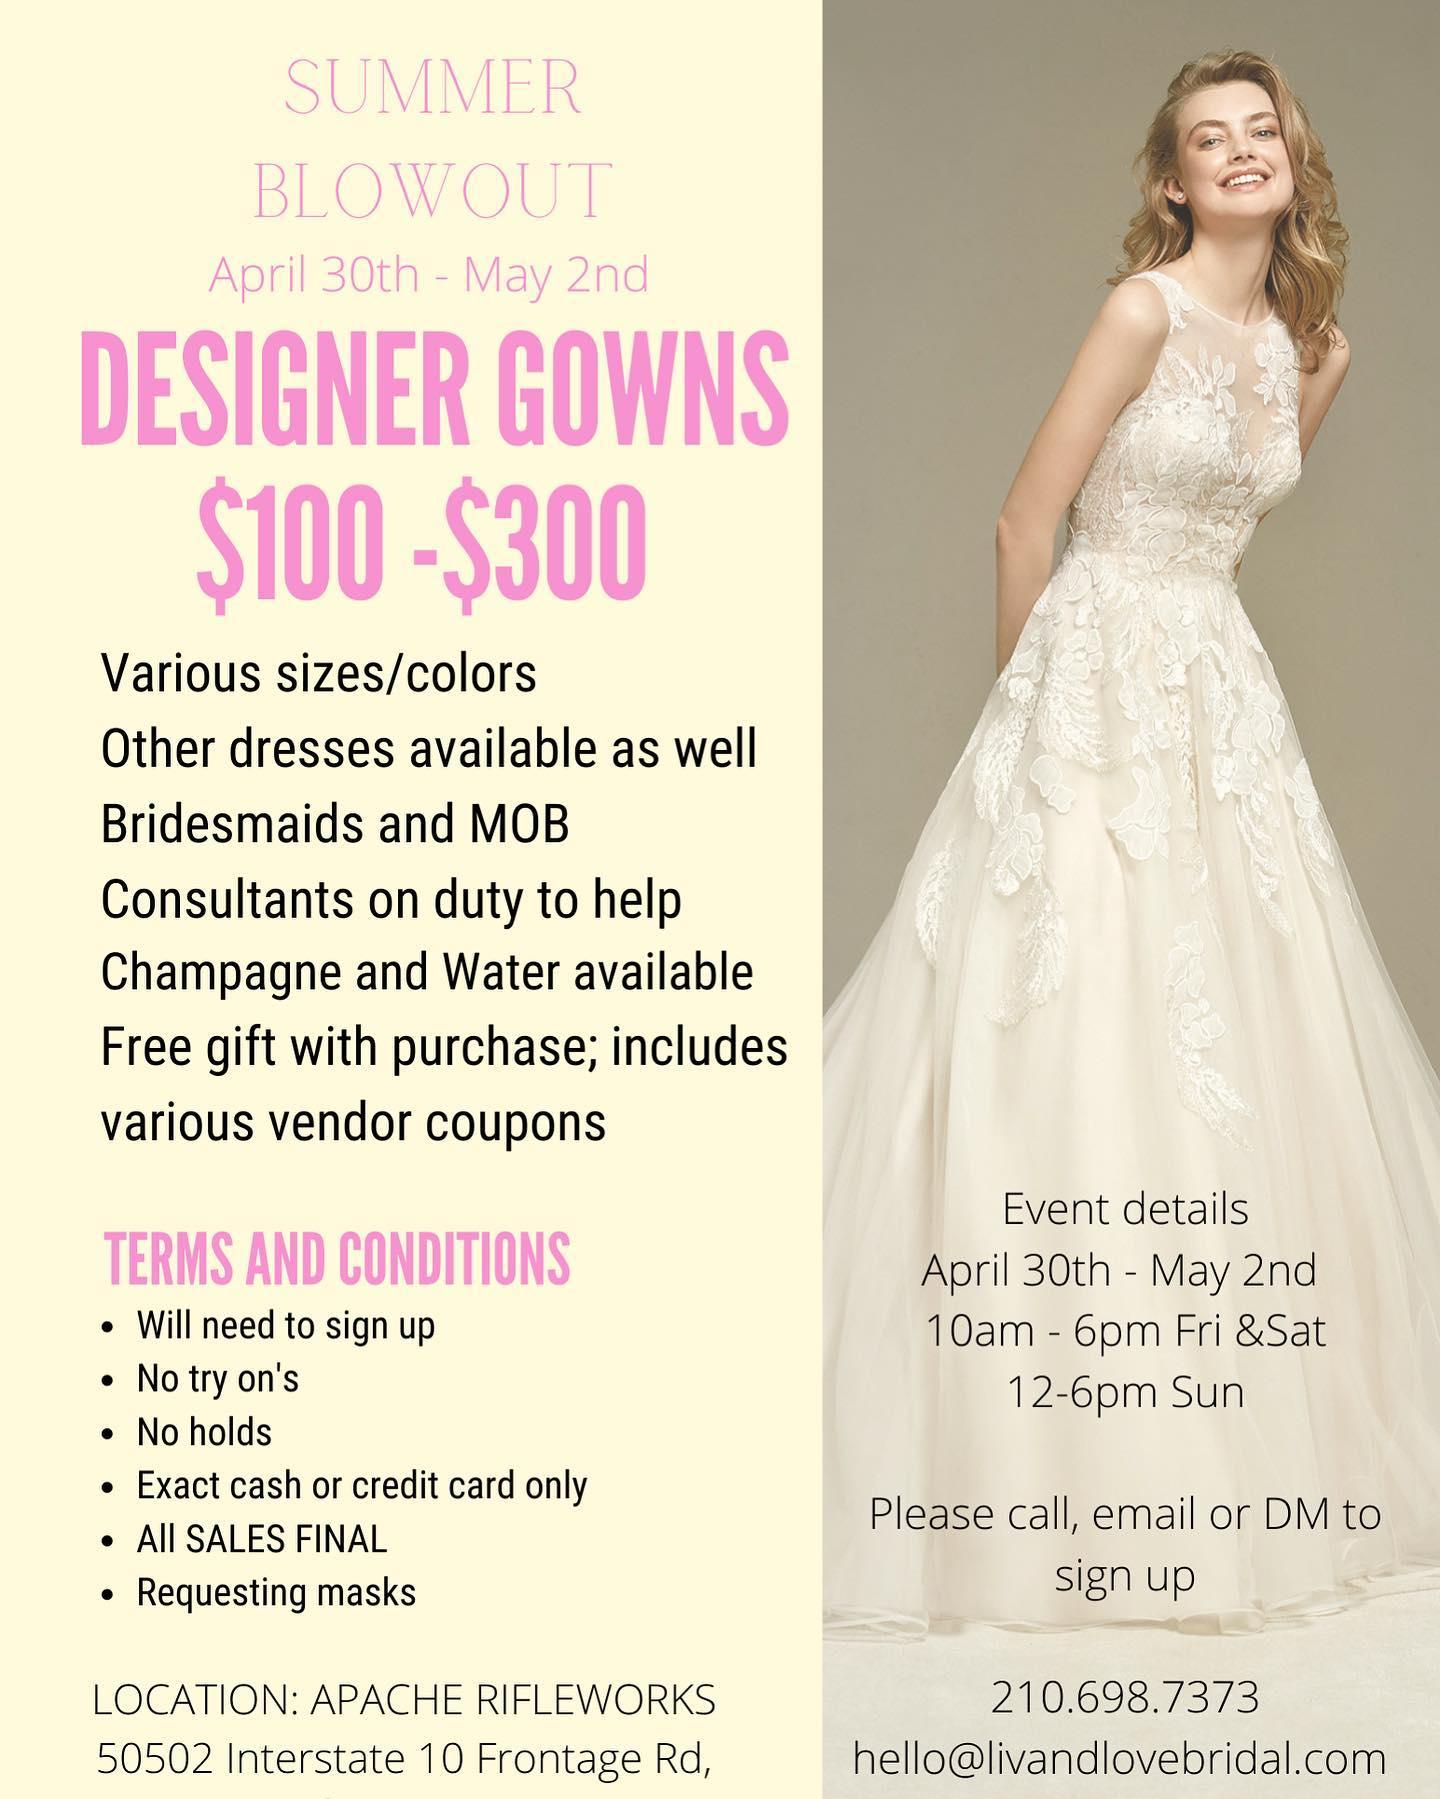 liv and love bridal shop in San Antonio texas huge summer blowout sale